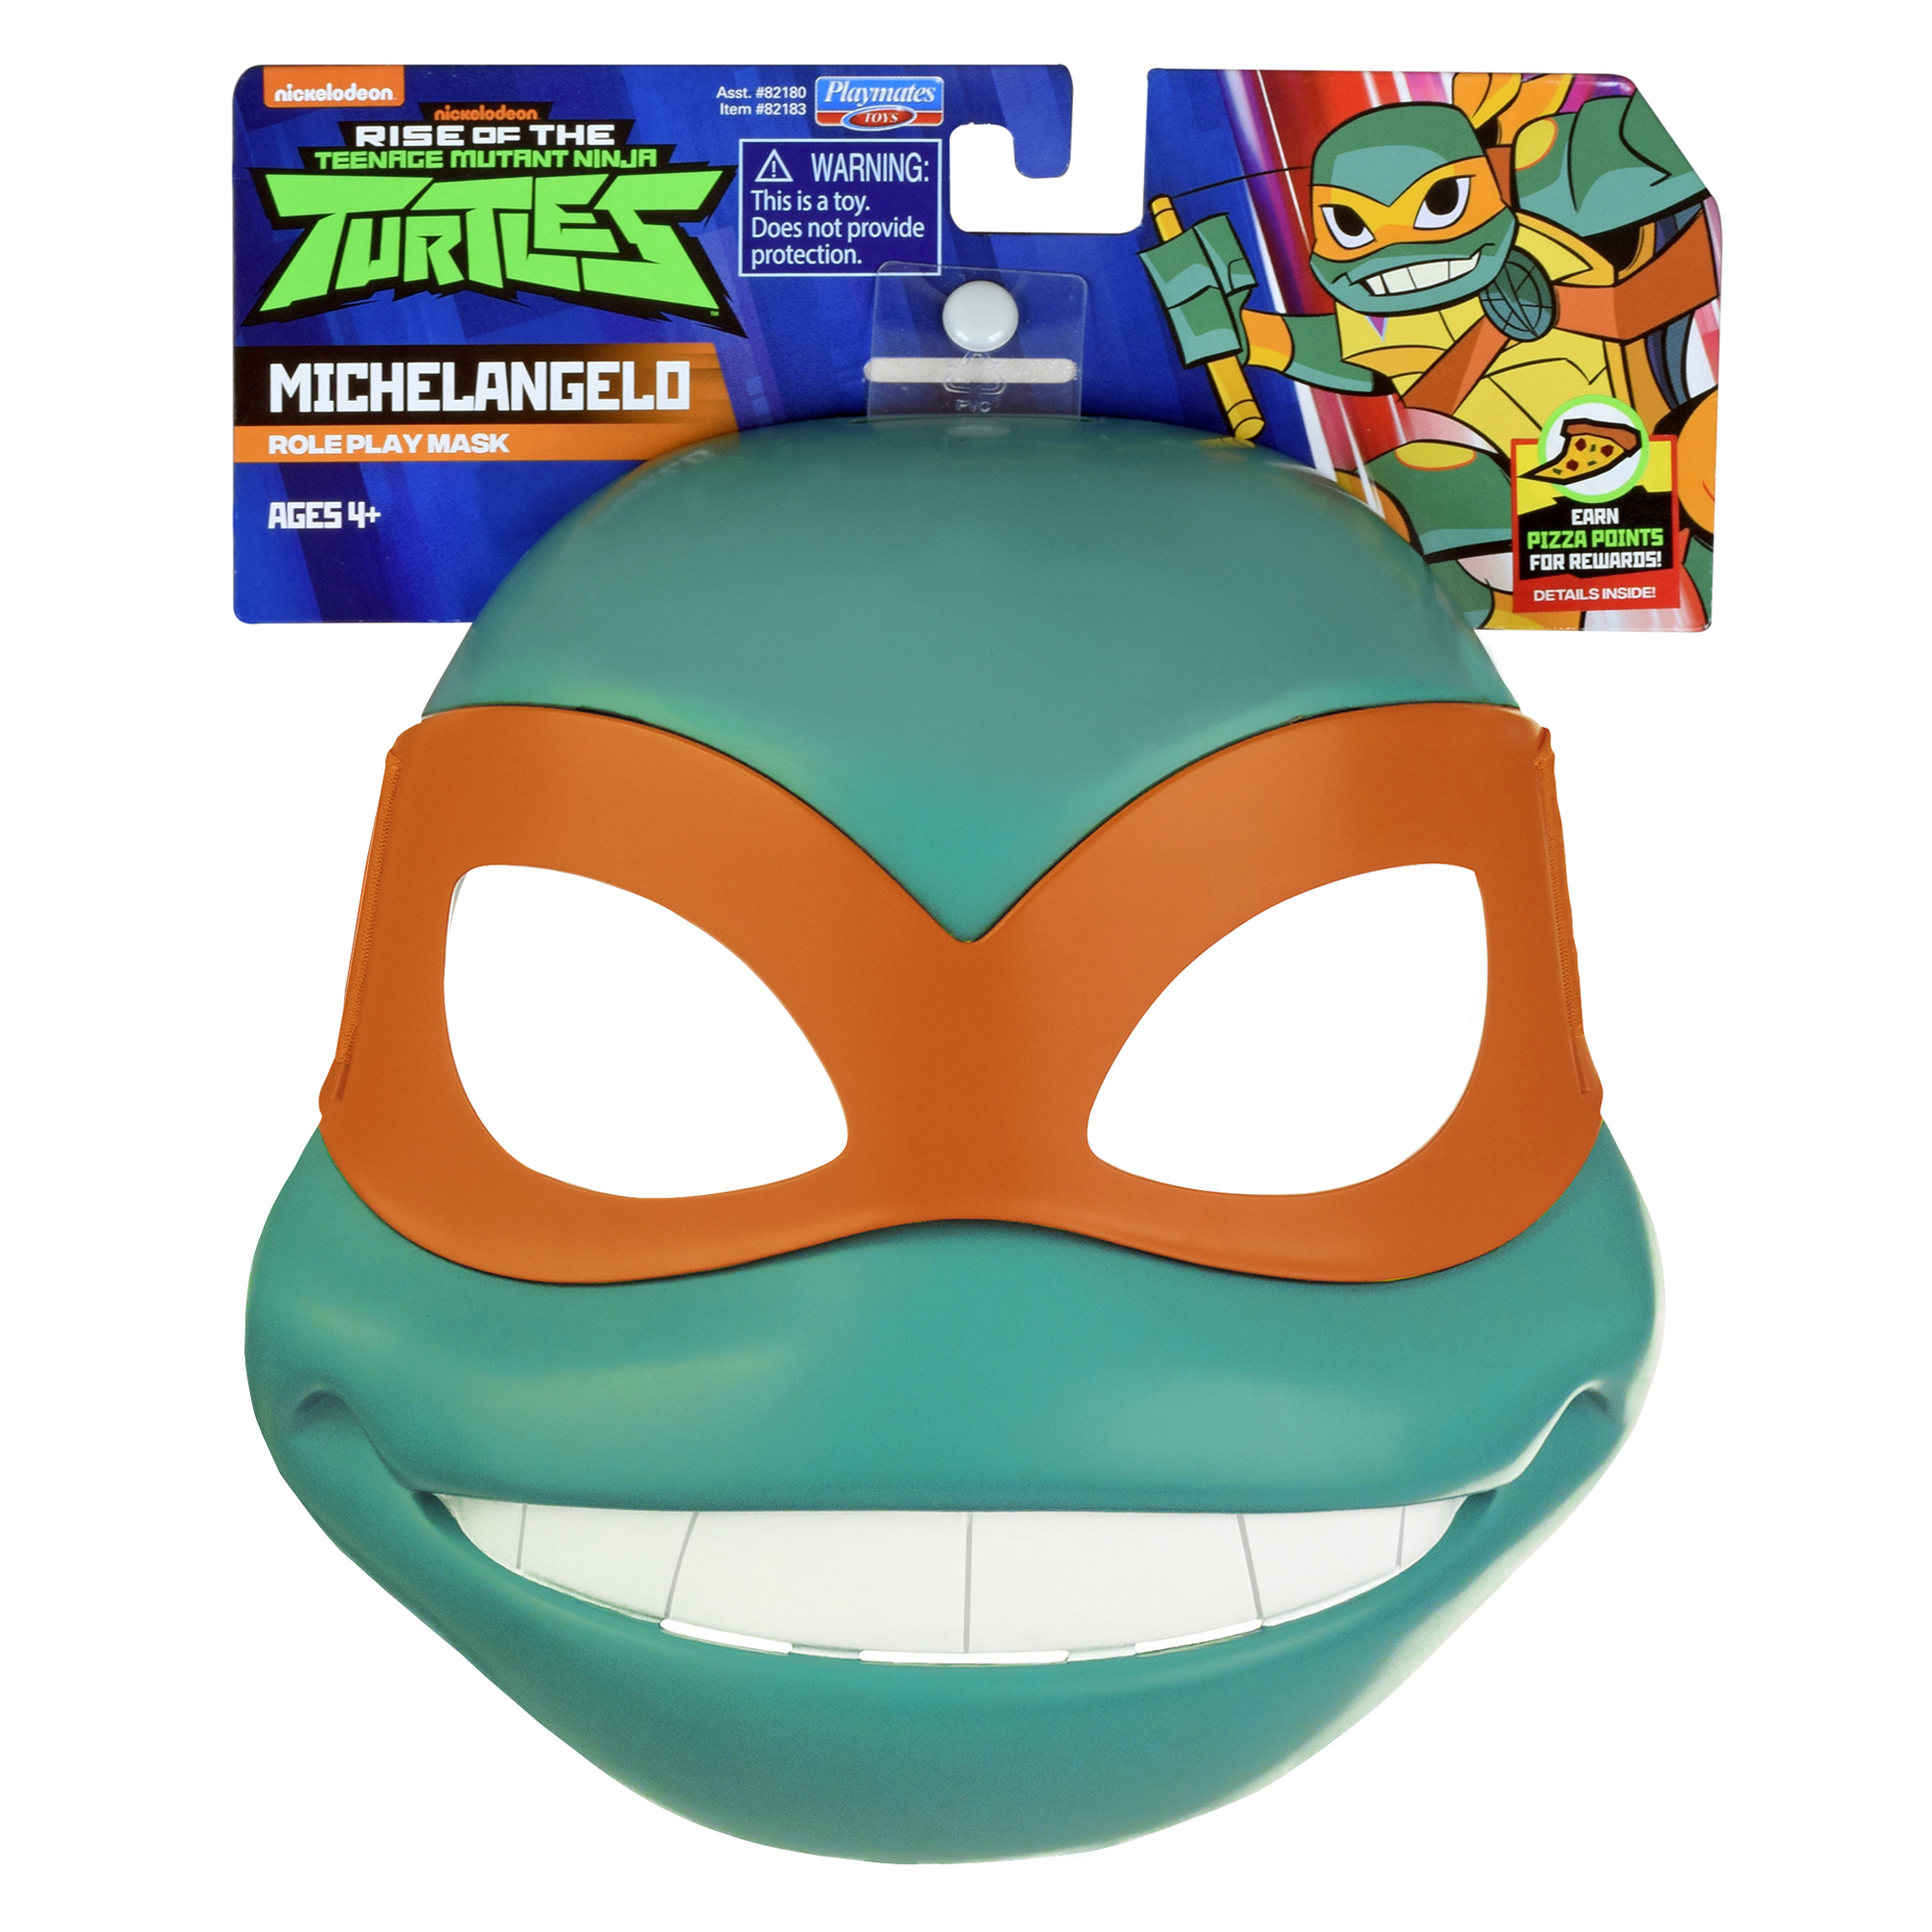 Rise of the Teenage Mutant Ninja Turtle Michelangelo's Role Play Mask